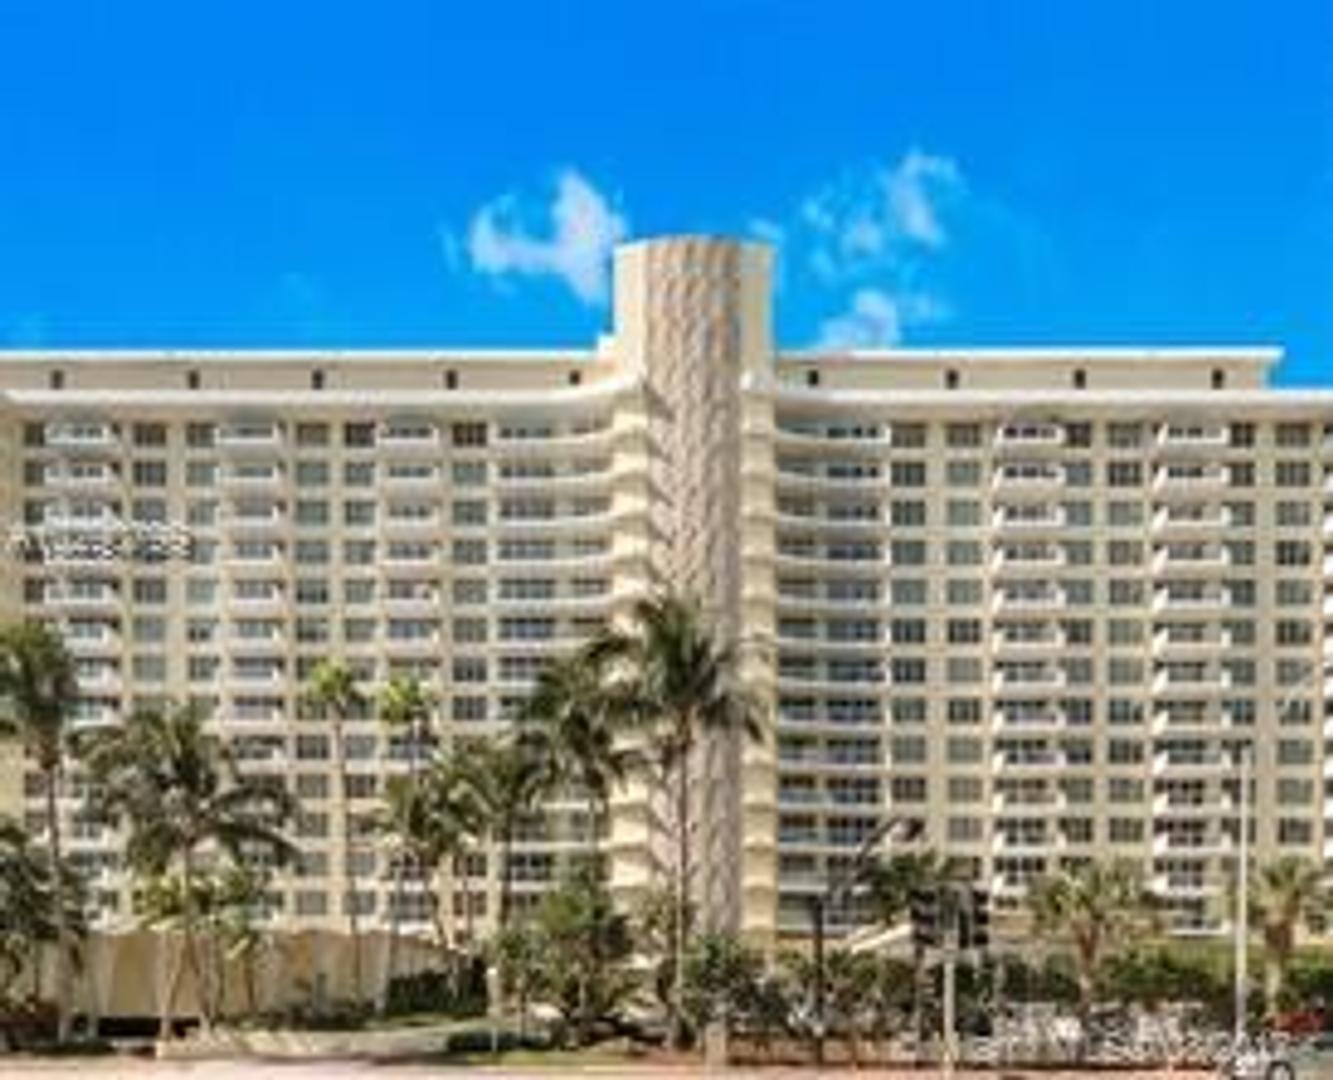 Miami Collins y la 56 Lower Pent House piso 17 a la calle